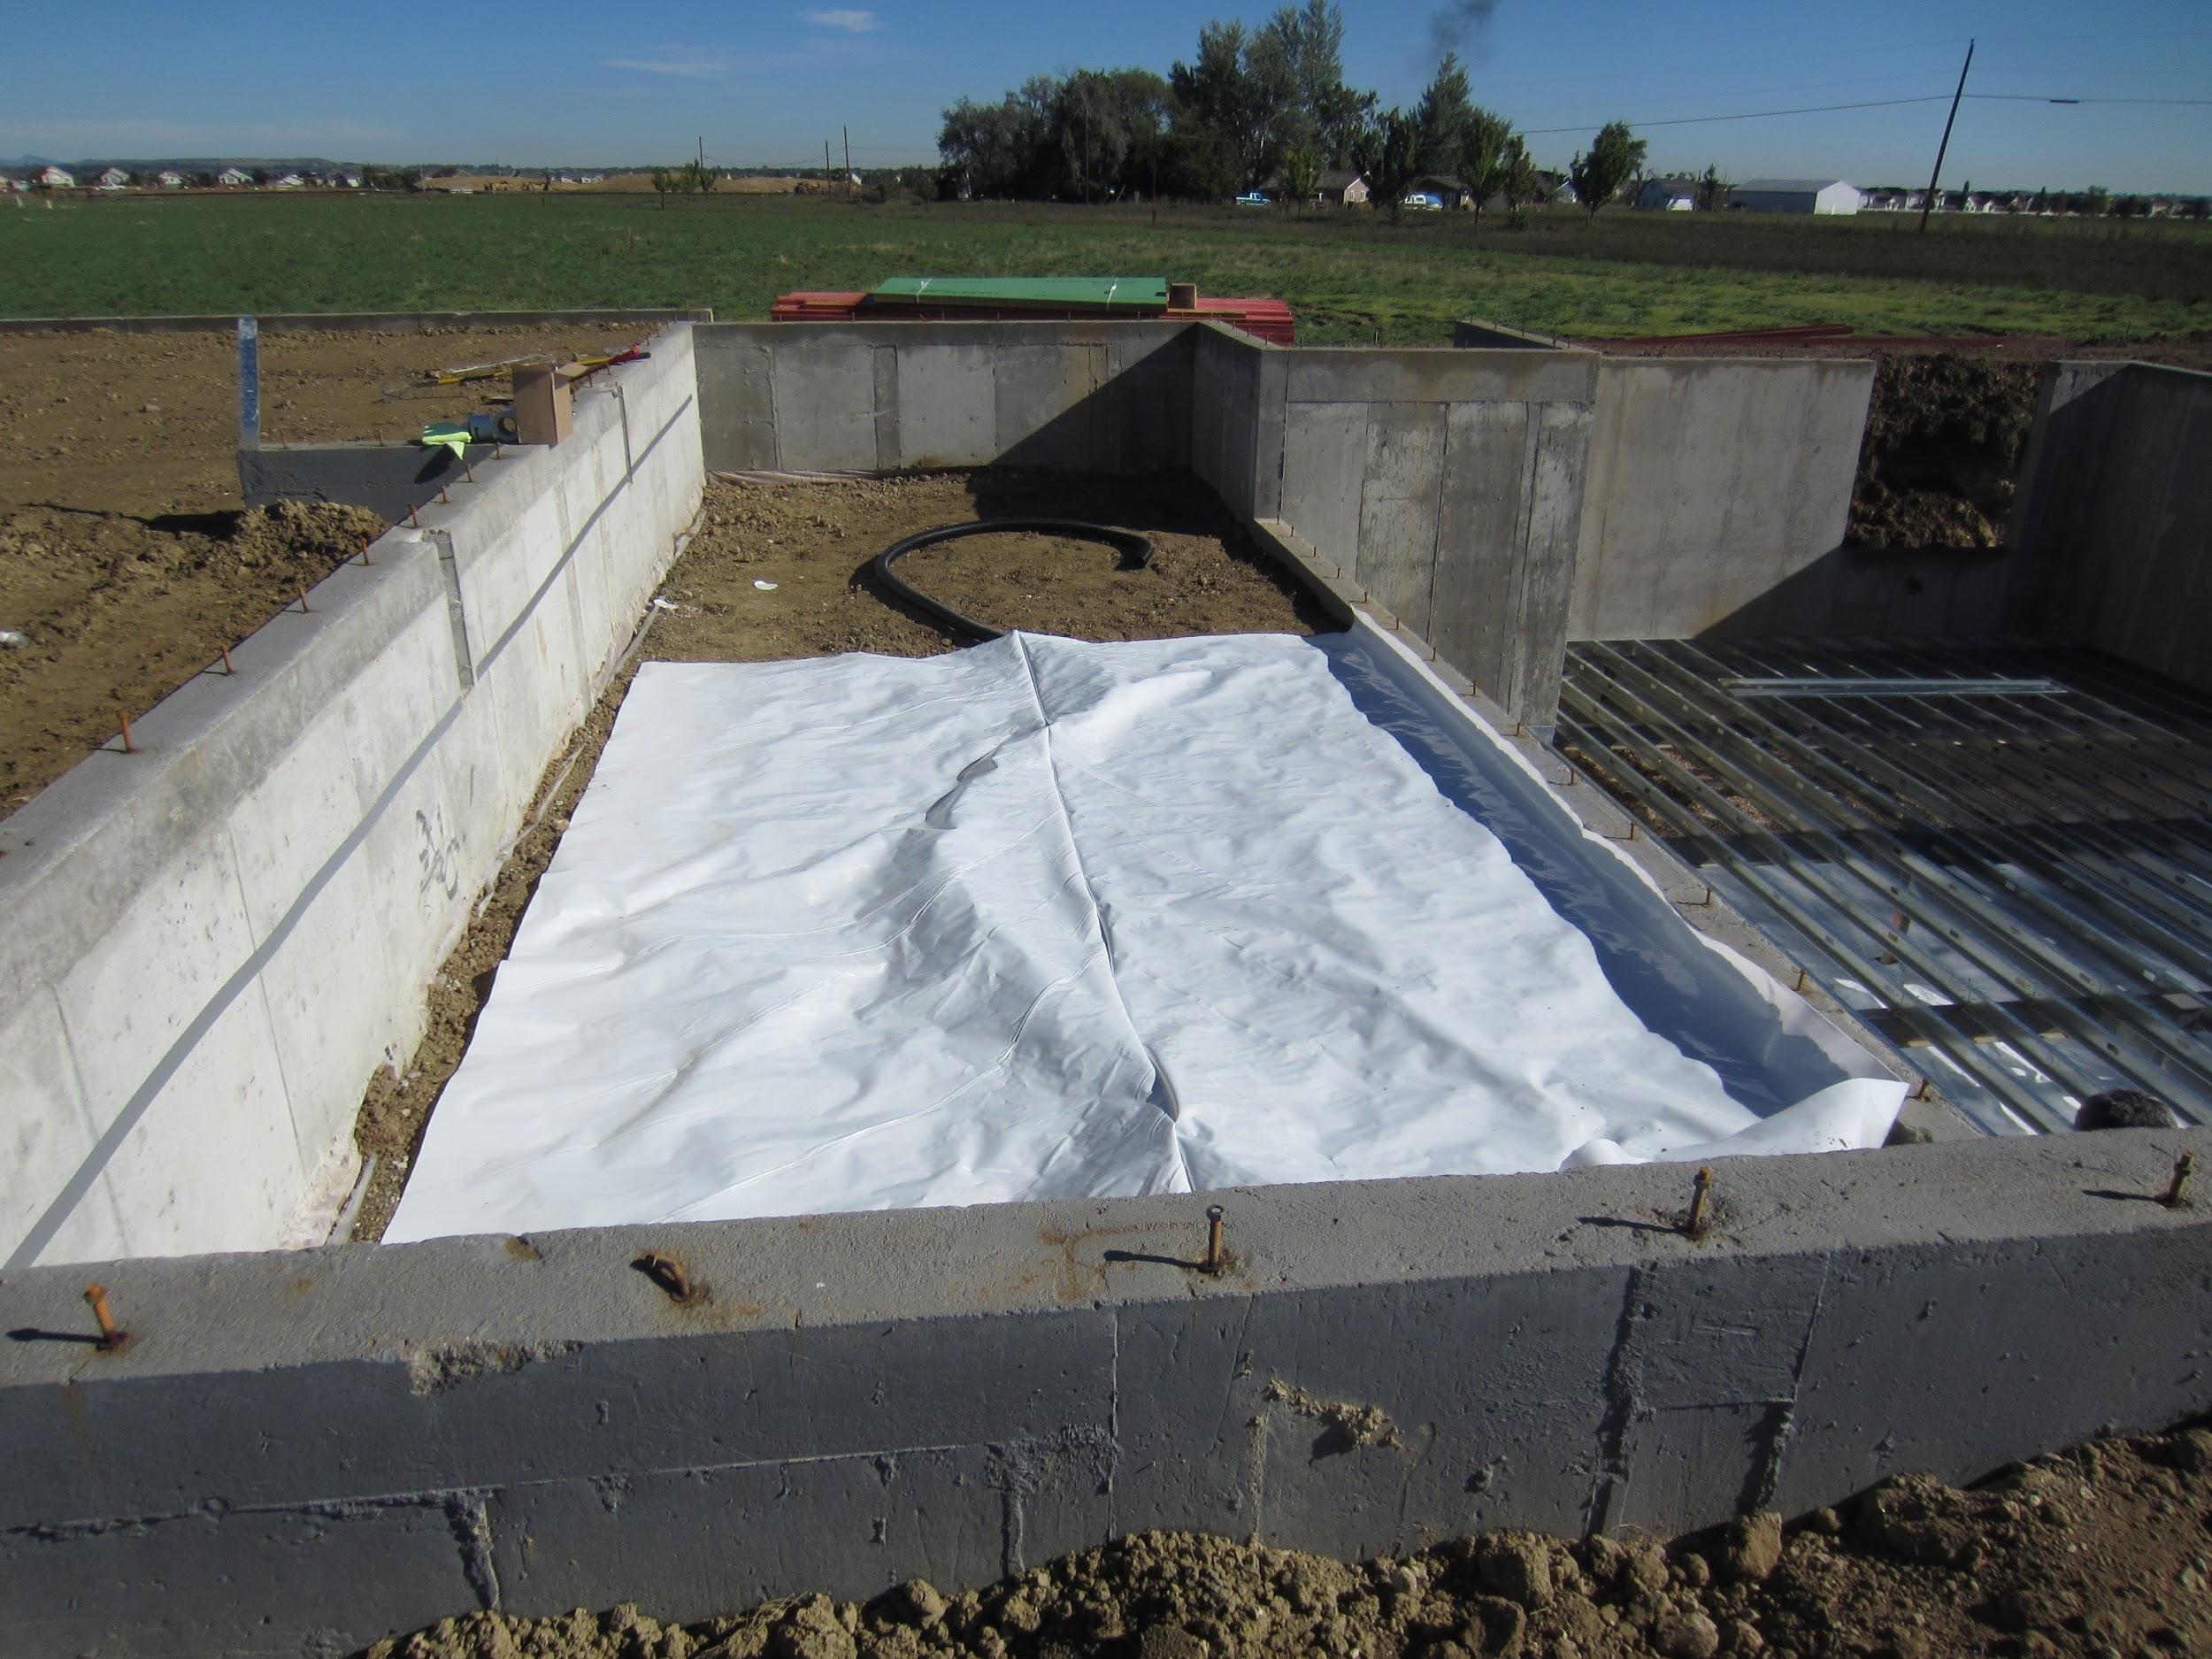 Crawl-Space-Encapsulation-for-New-Home-Construction